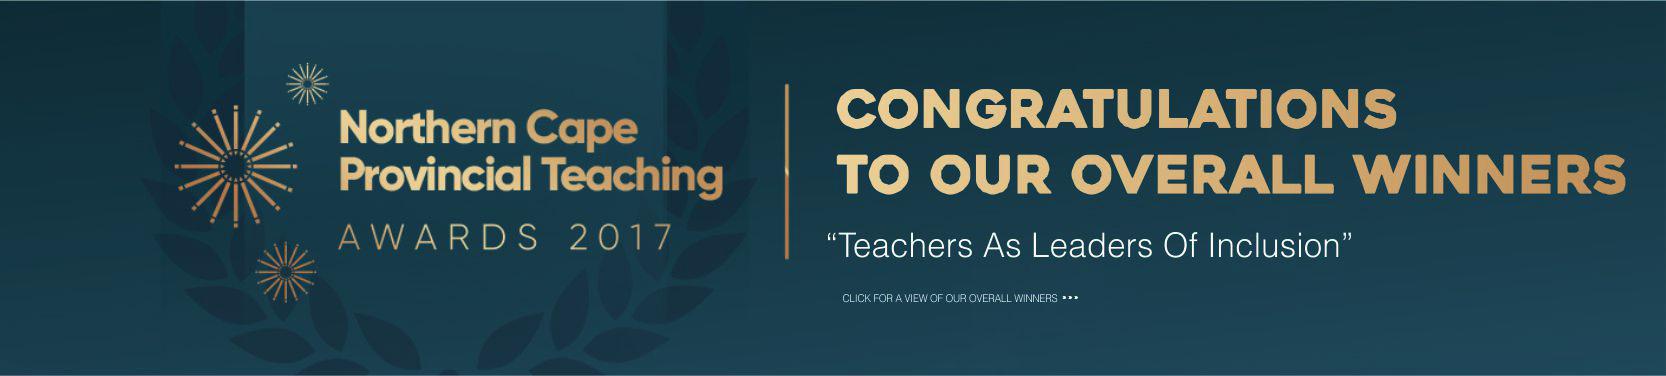 teachers Awards 2017 1